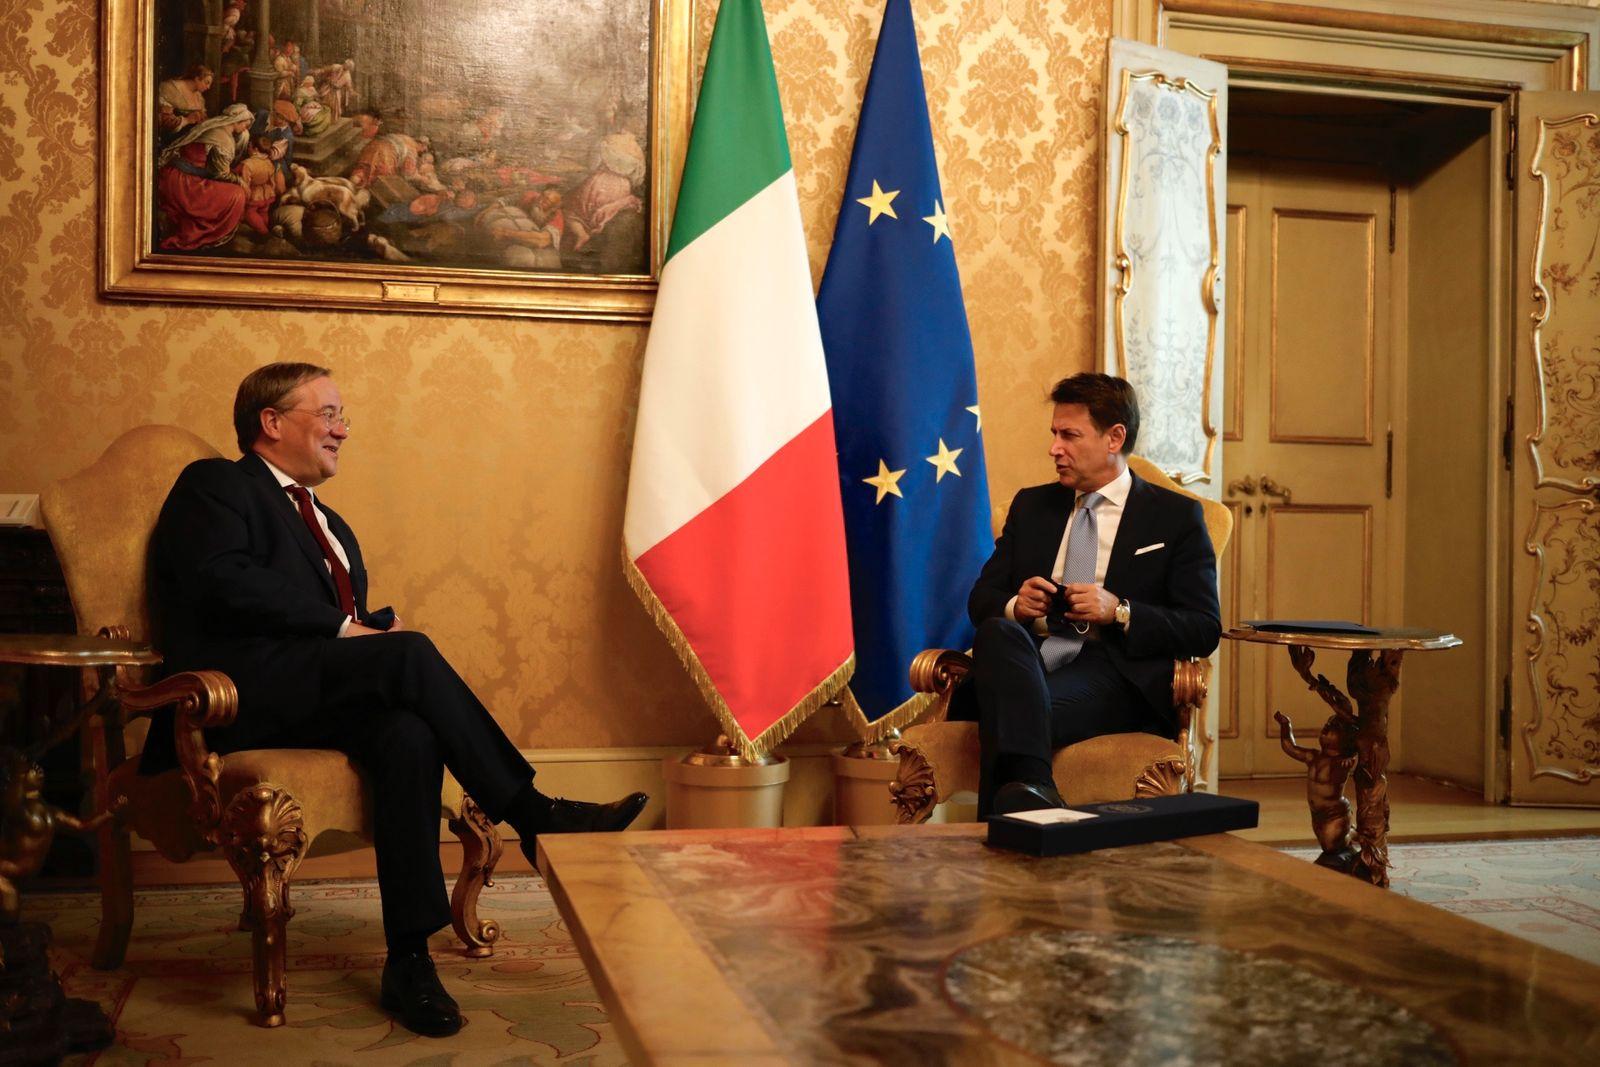 Rom-Reise des Ministerpräsidenten Laschet